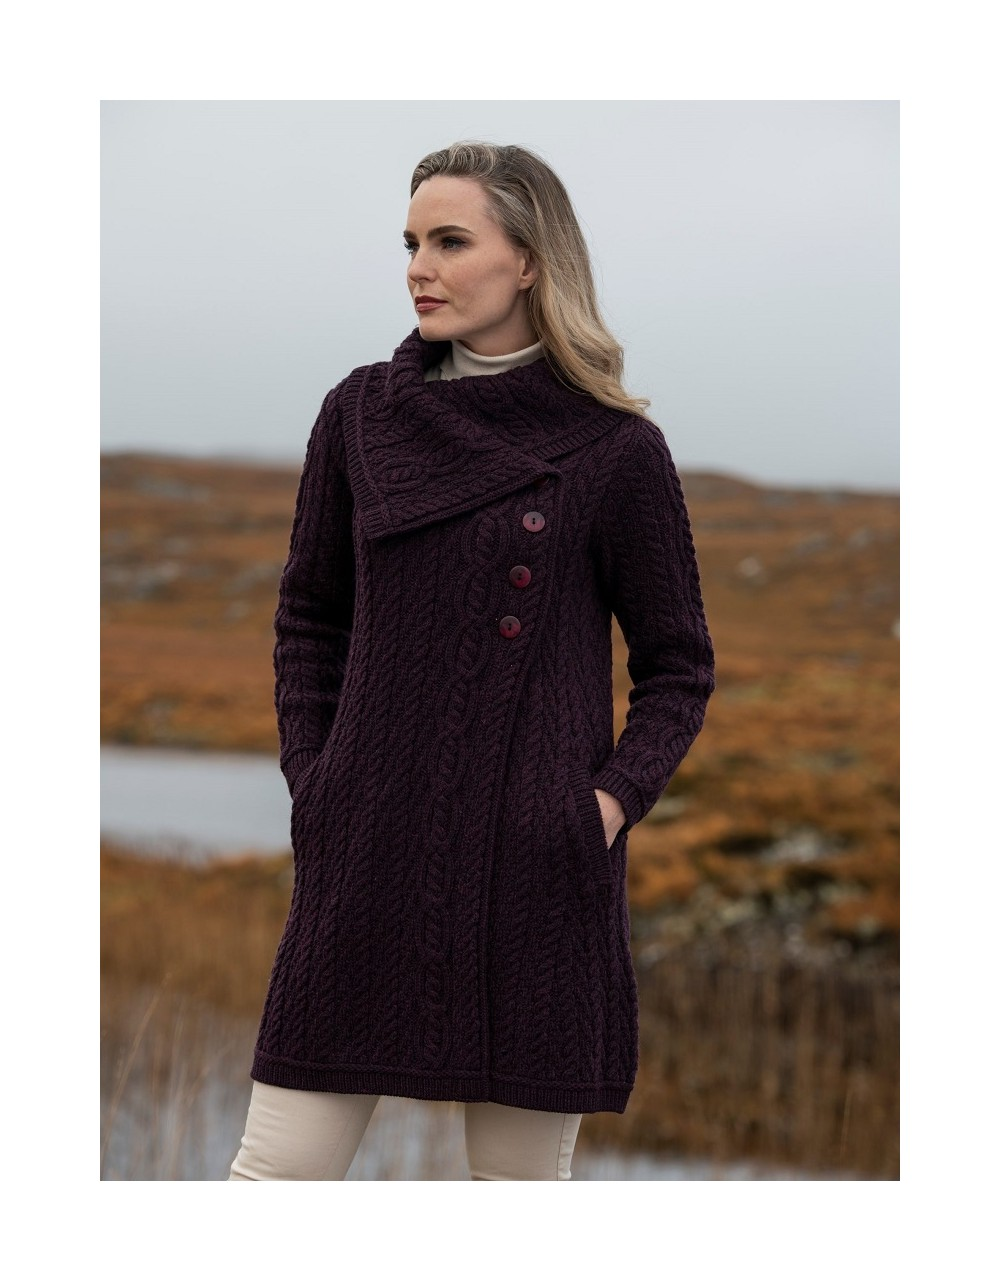 Aran Style Large Collar Coat Damson|Aran Knitwear Coats|Irish Handcrafts